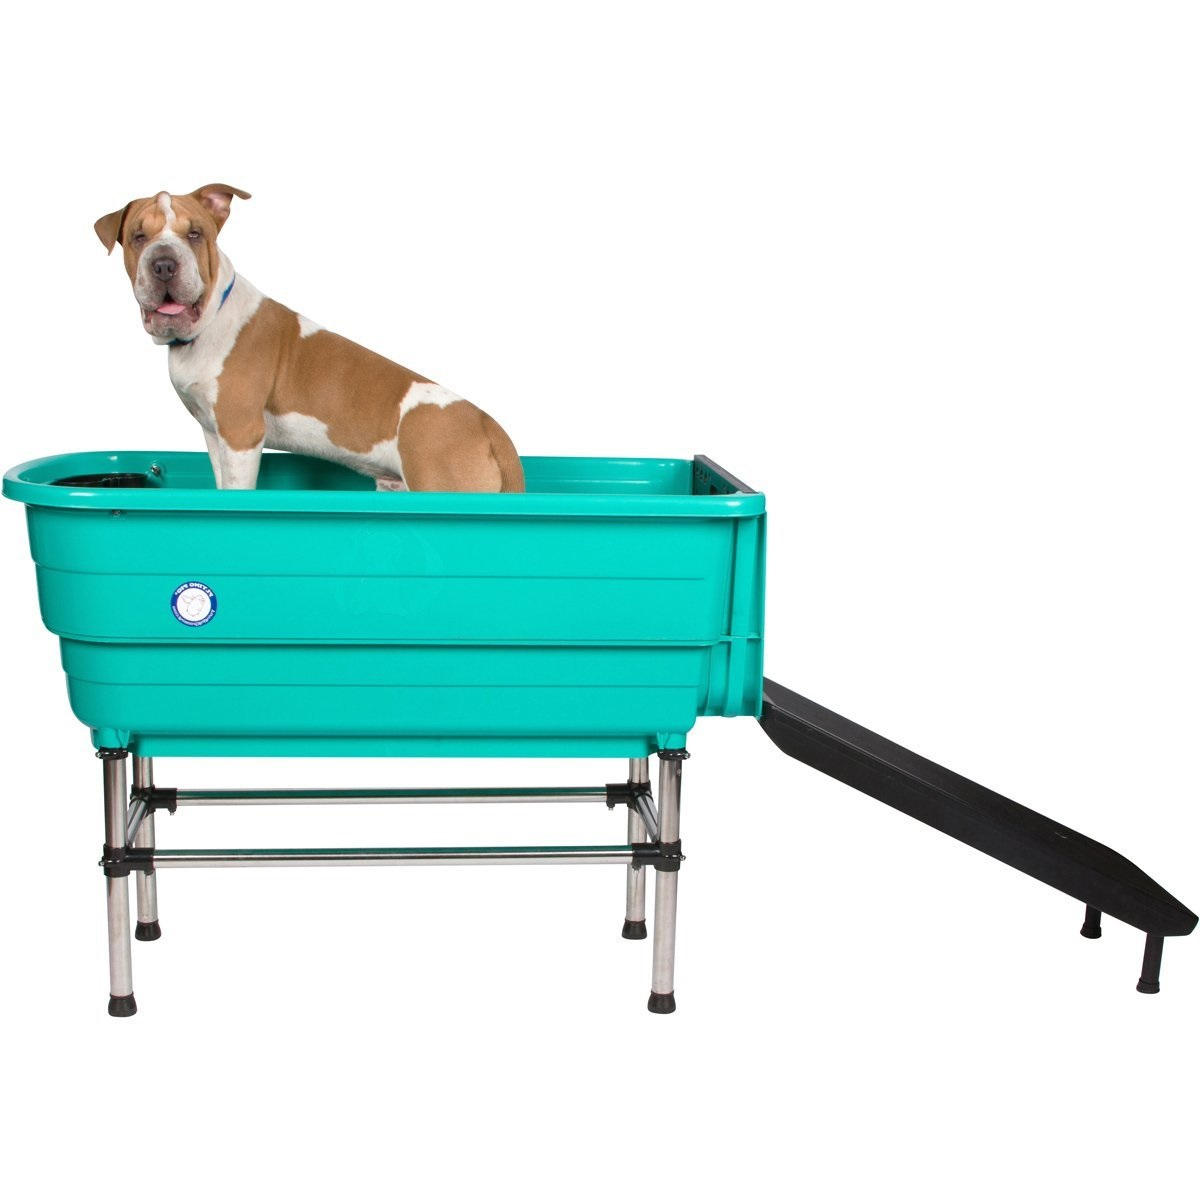 собака в зеленой ванне